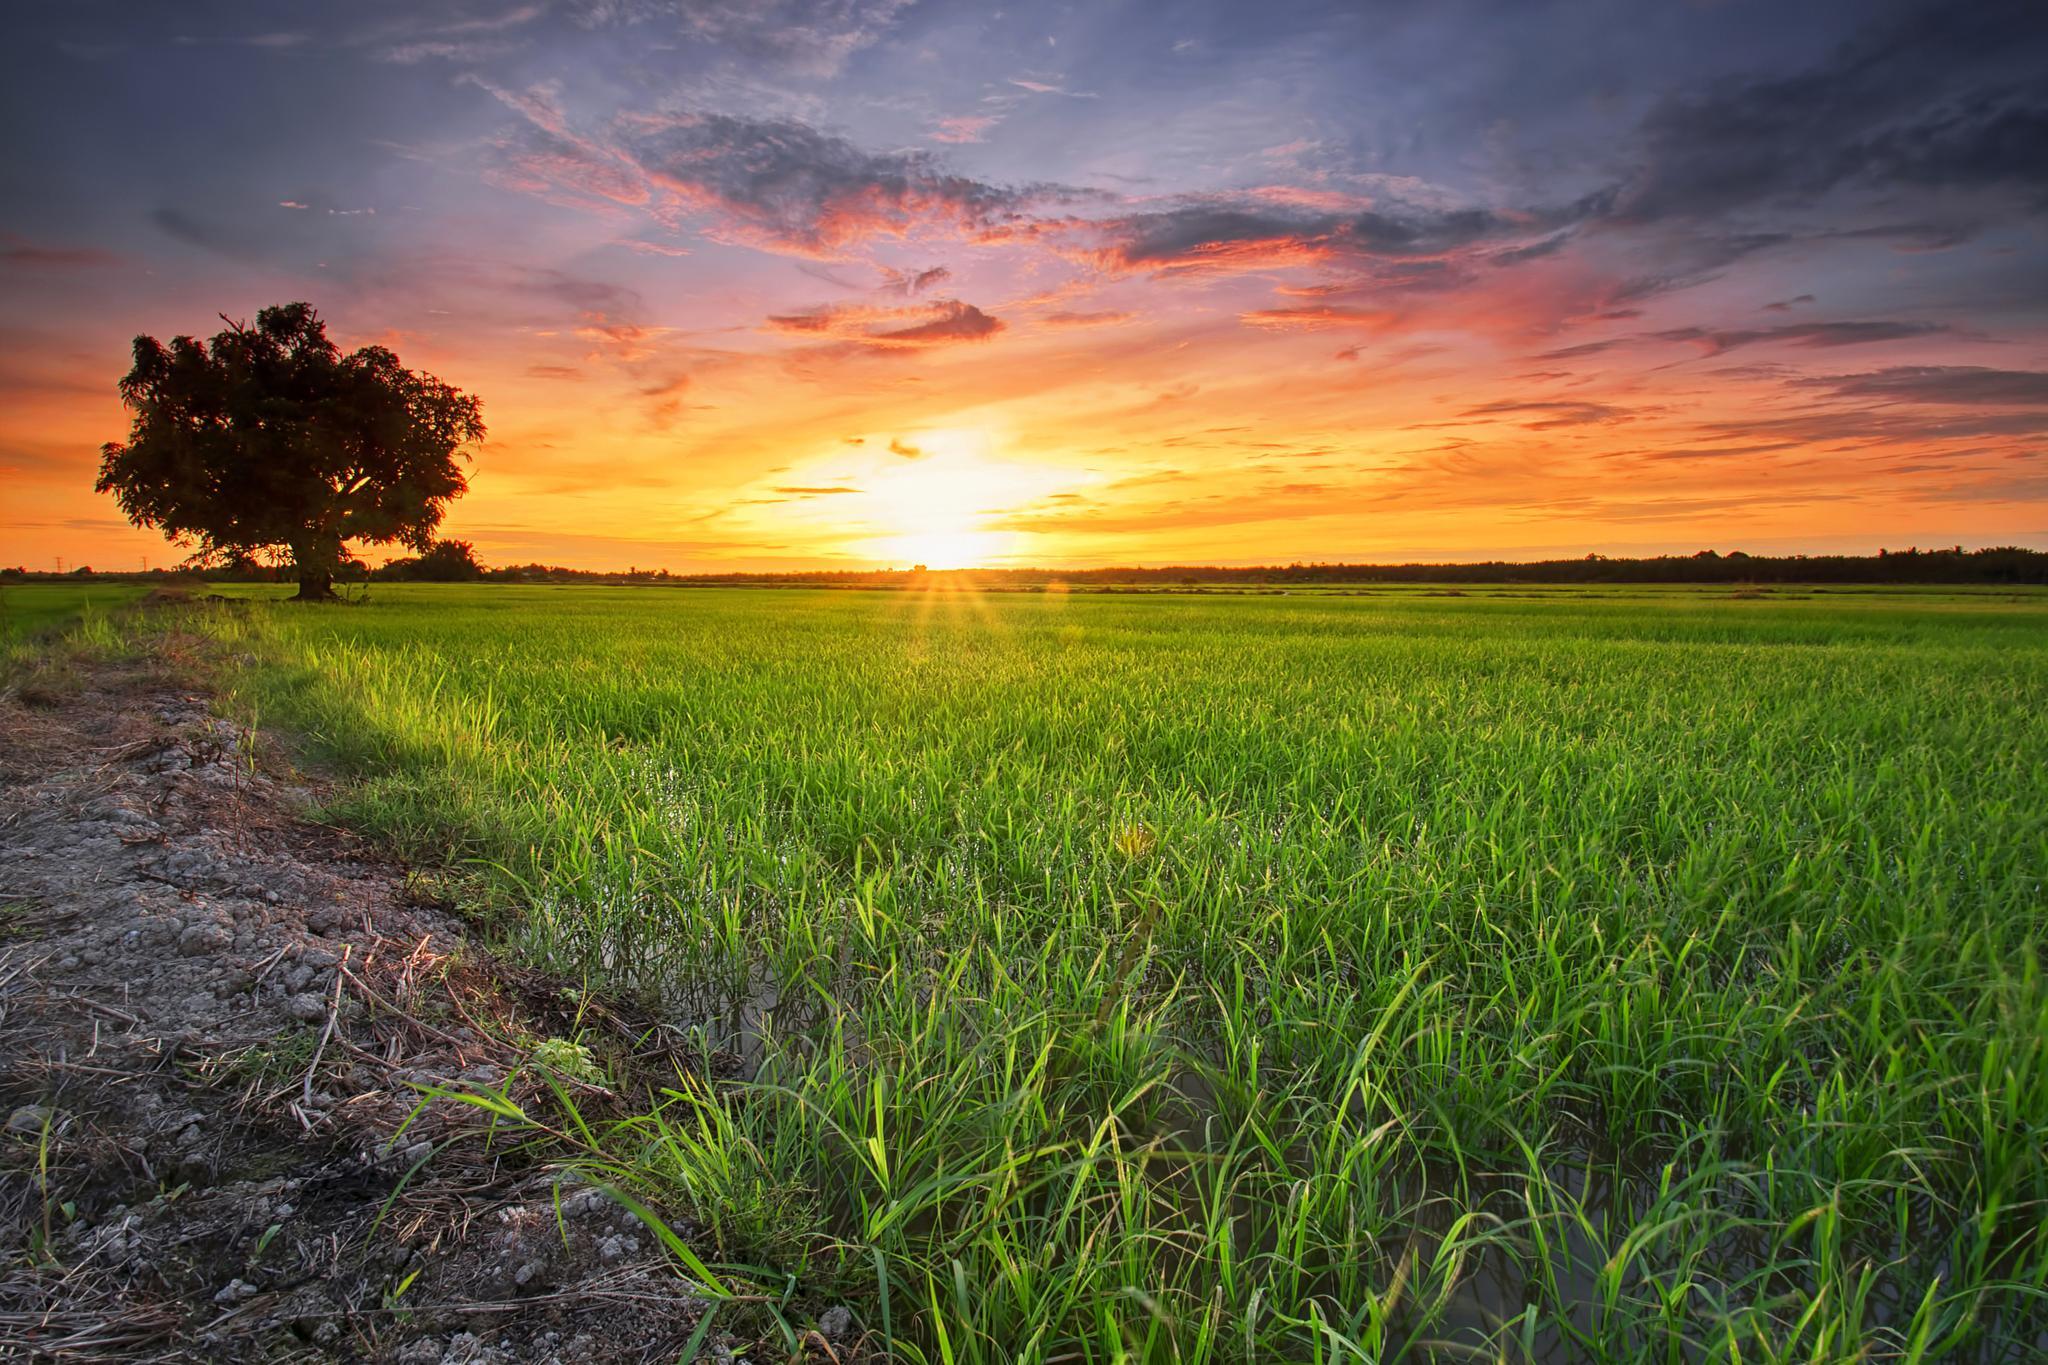 Paddy at sunset by fiz_zero